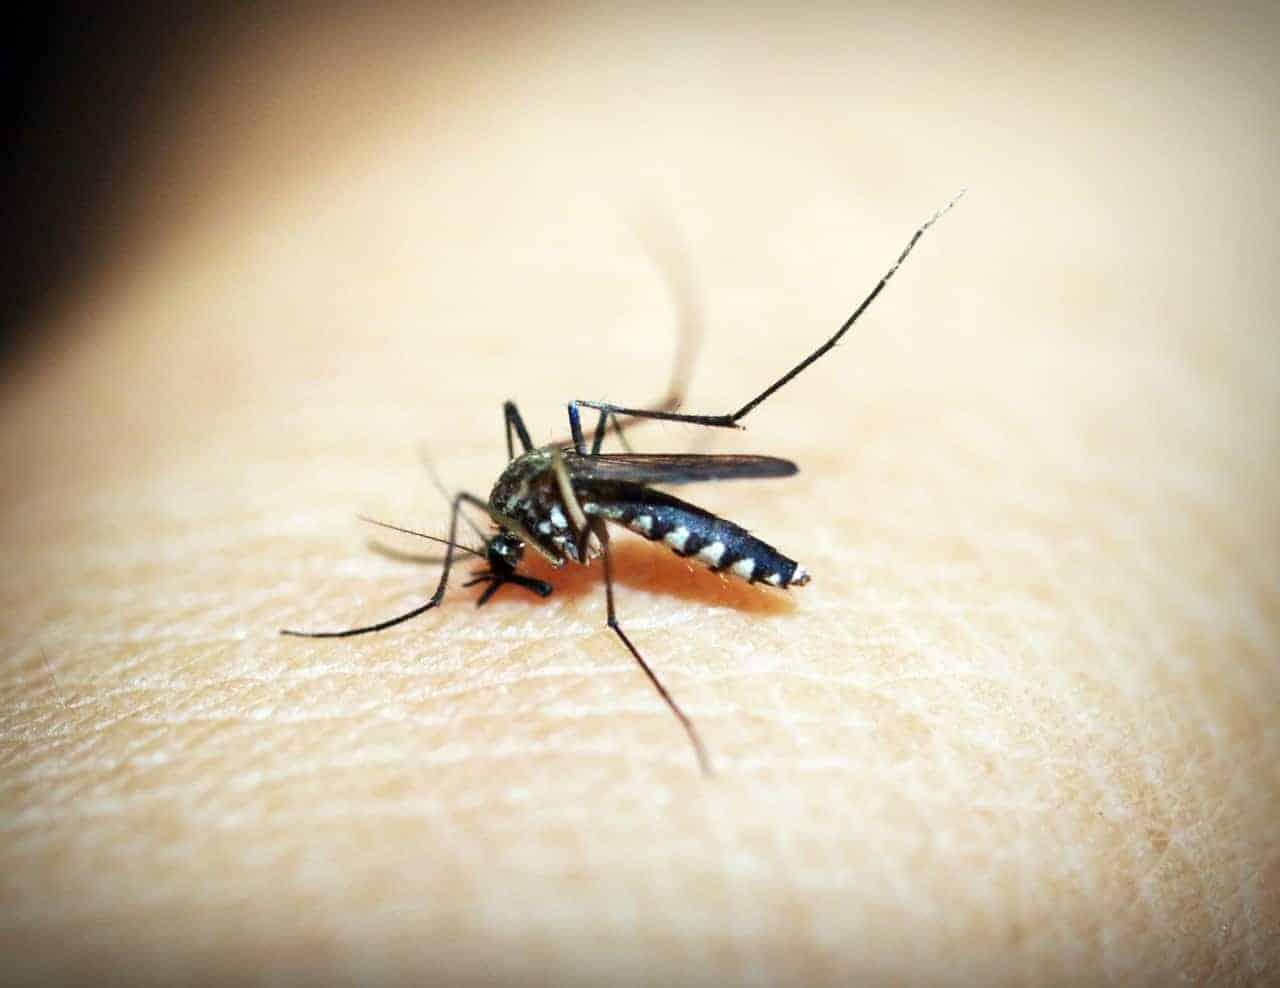 A mosquito biting someone